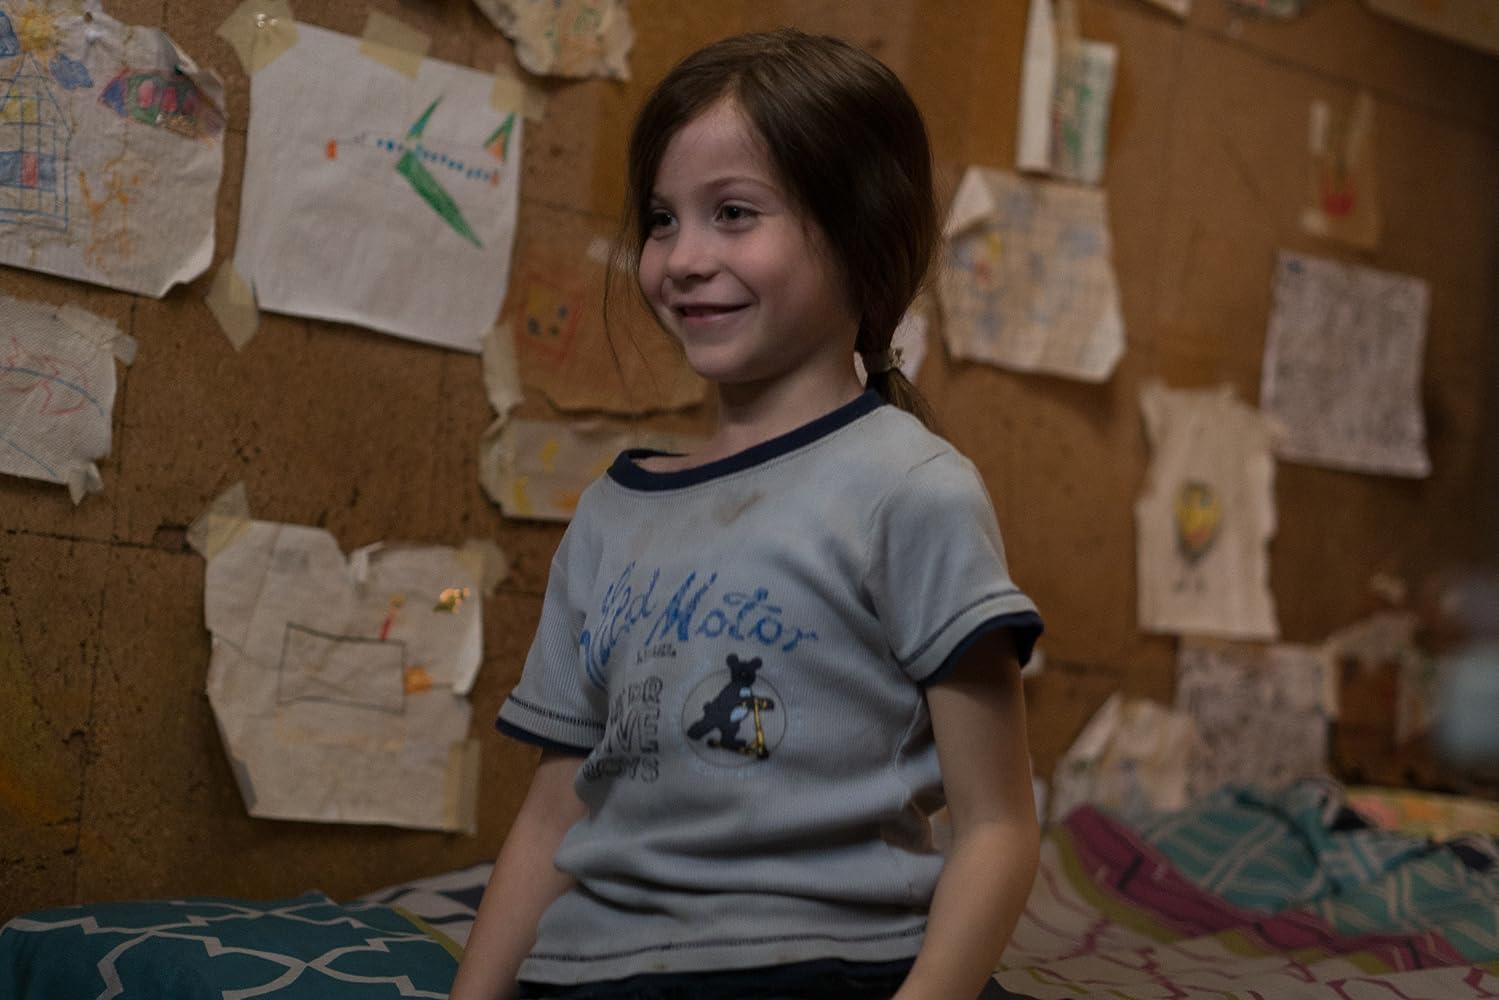 Jacob Tremblay in Room (2015)